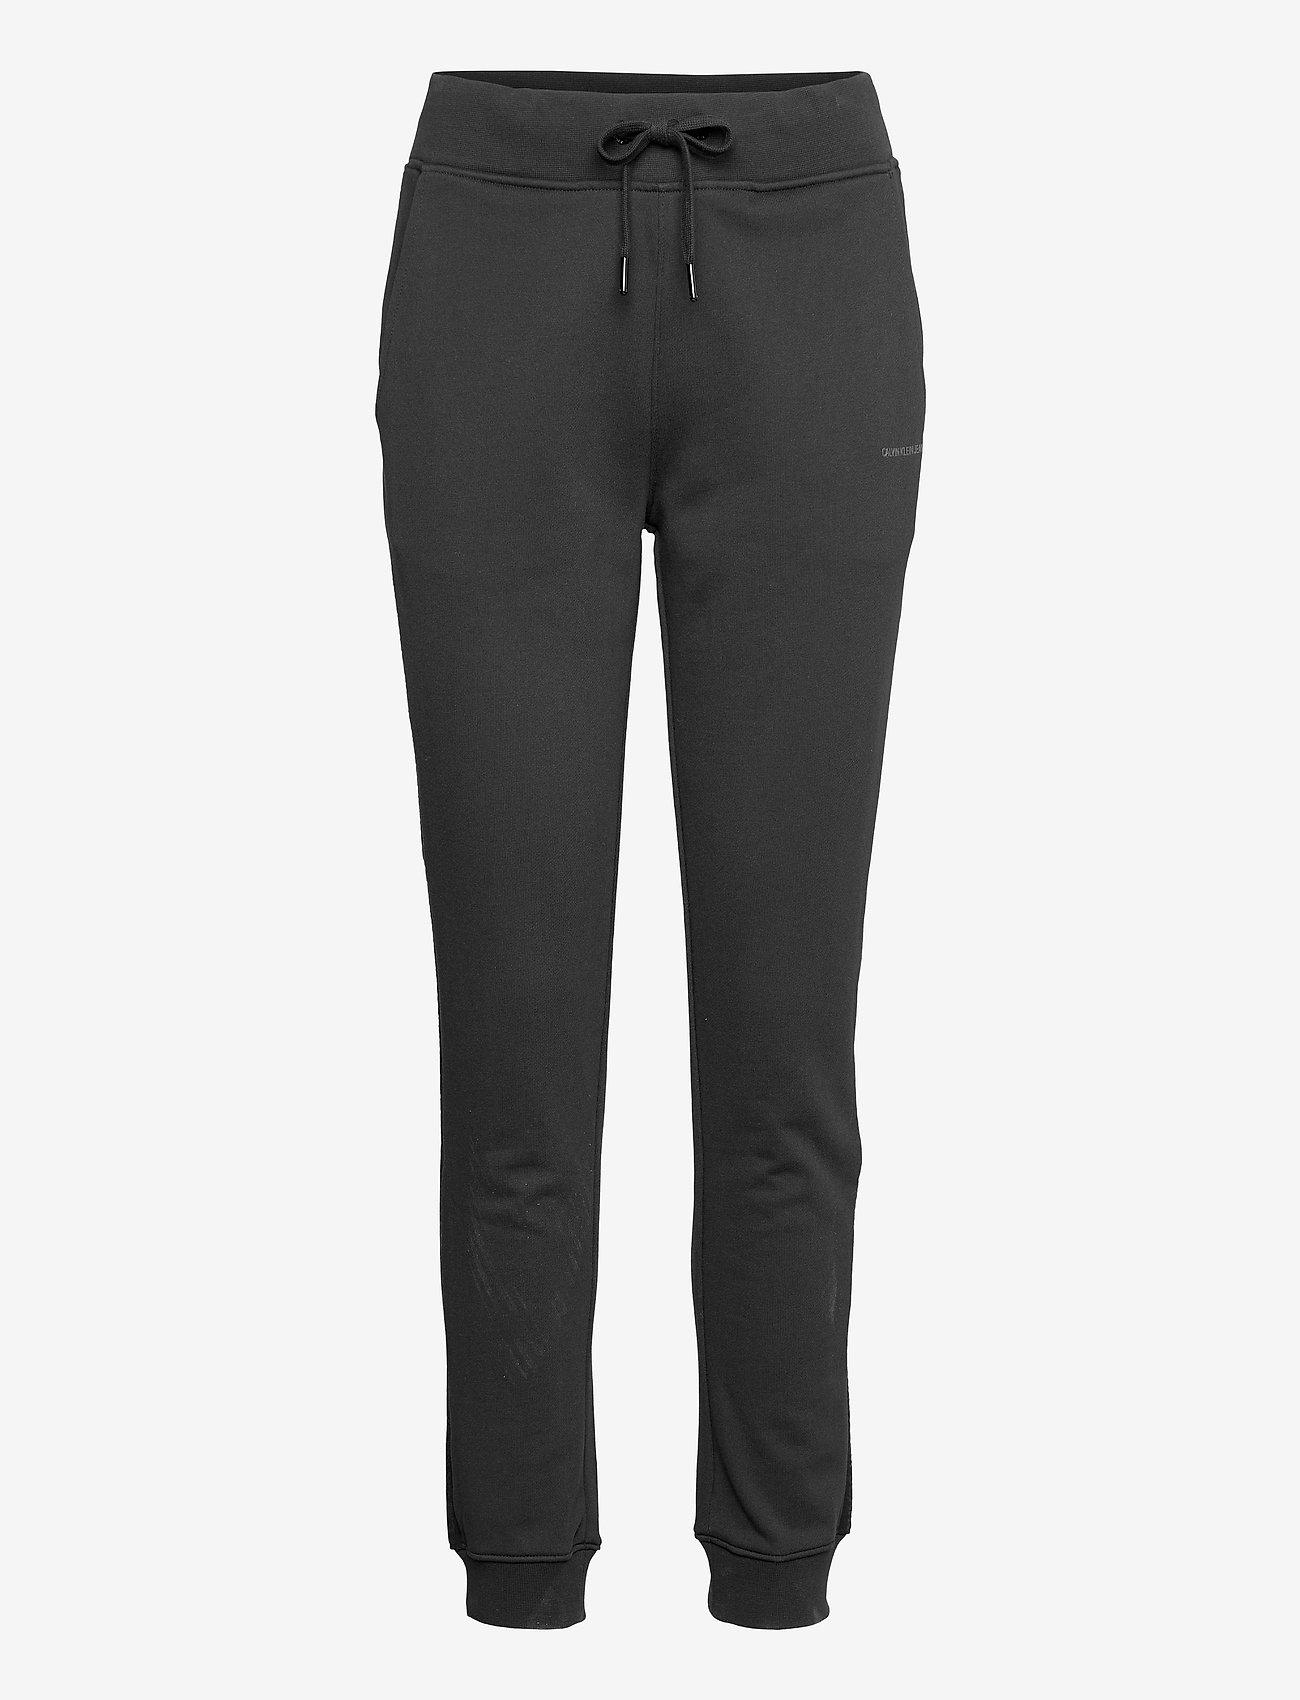 Calvin Klein Jeans - LOGO TRIM JOGGING PANT - klær - ck black - 0